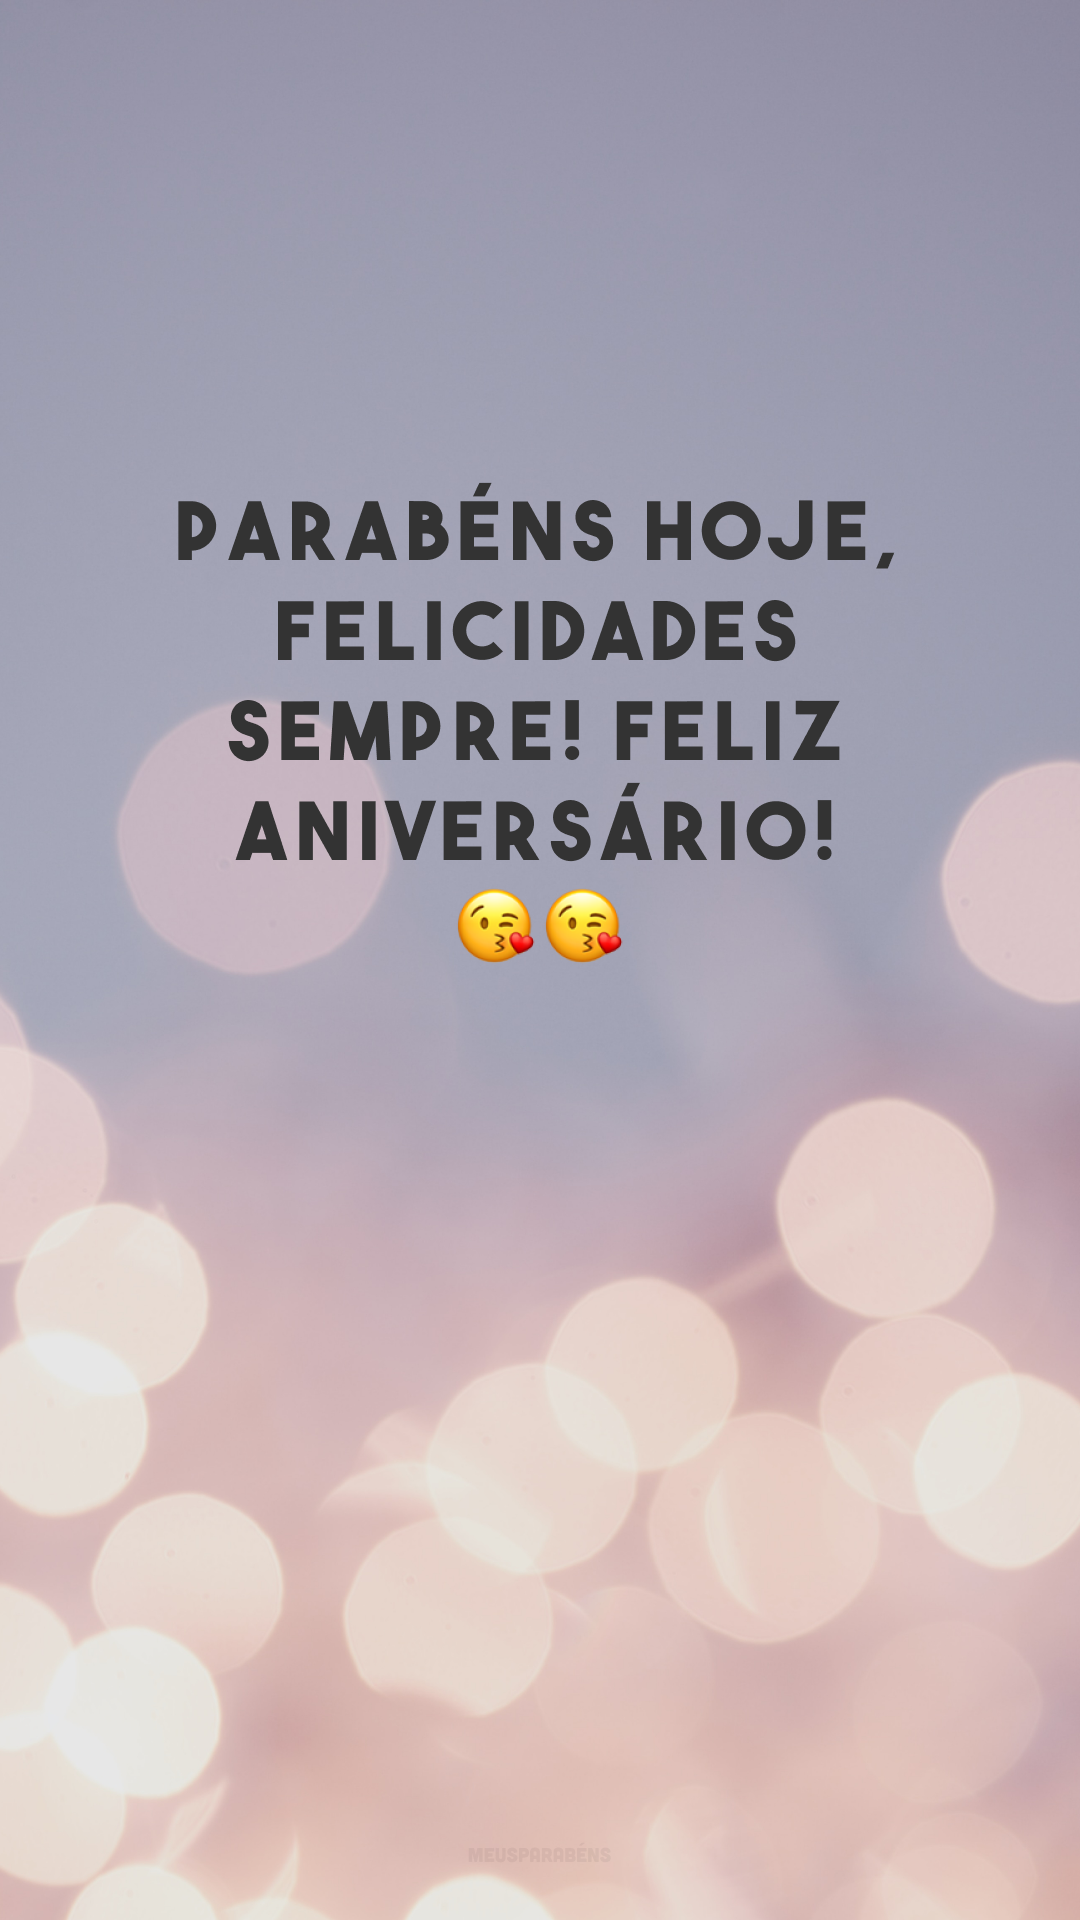 Parabéns hoje, felicidades sempre! Feliz aniversário! 😘😘